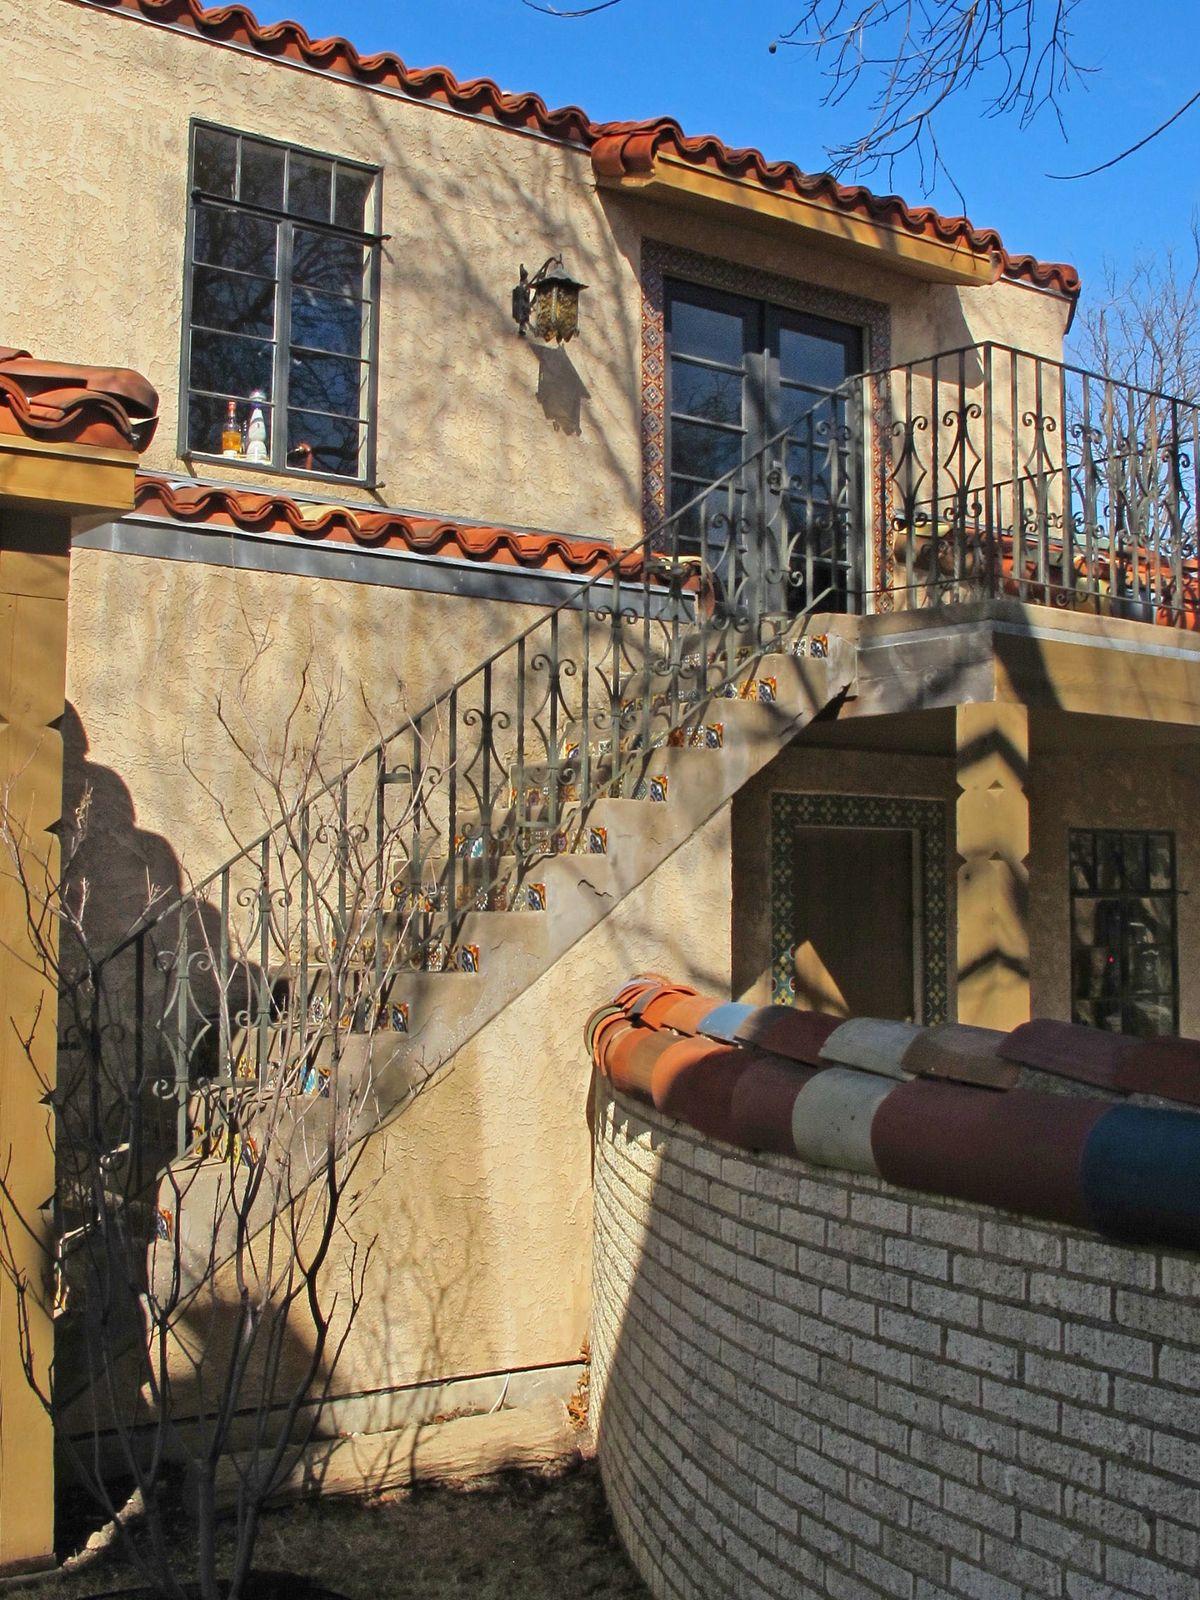 Historic Hutsell Mediterranean Home Photo Video Shoot Location 52.jpg